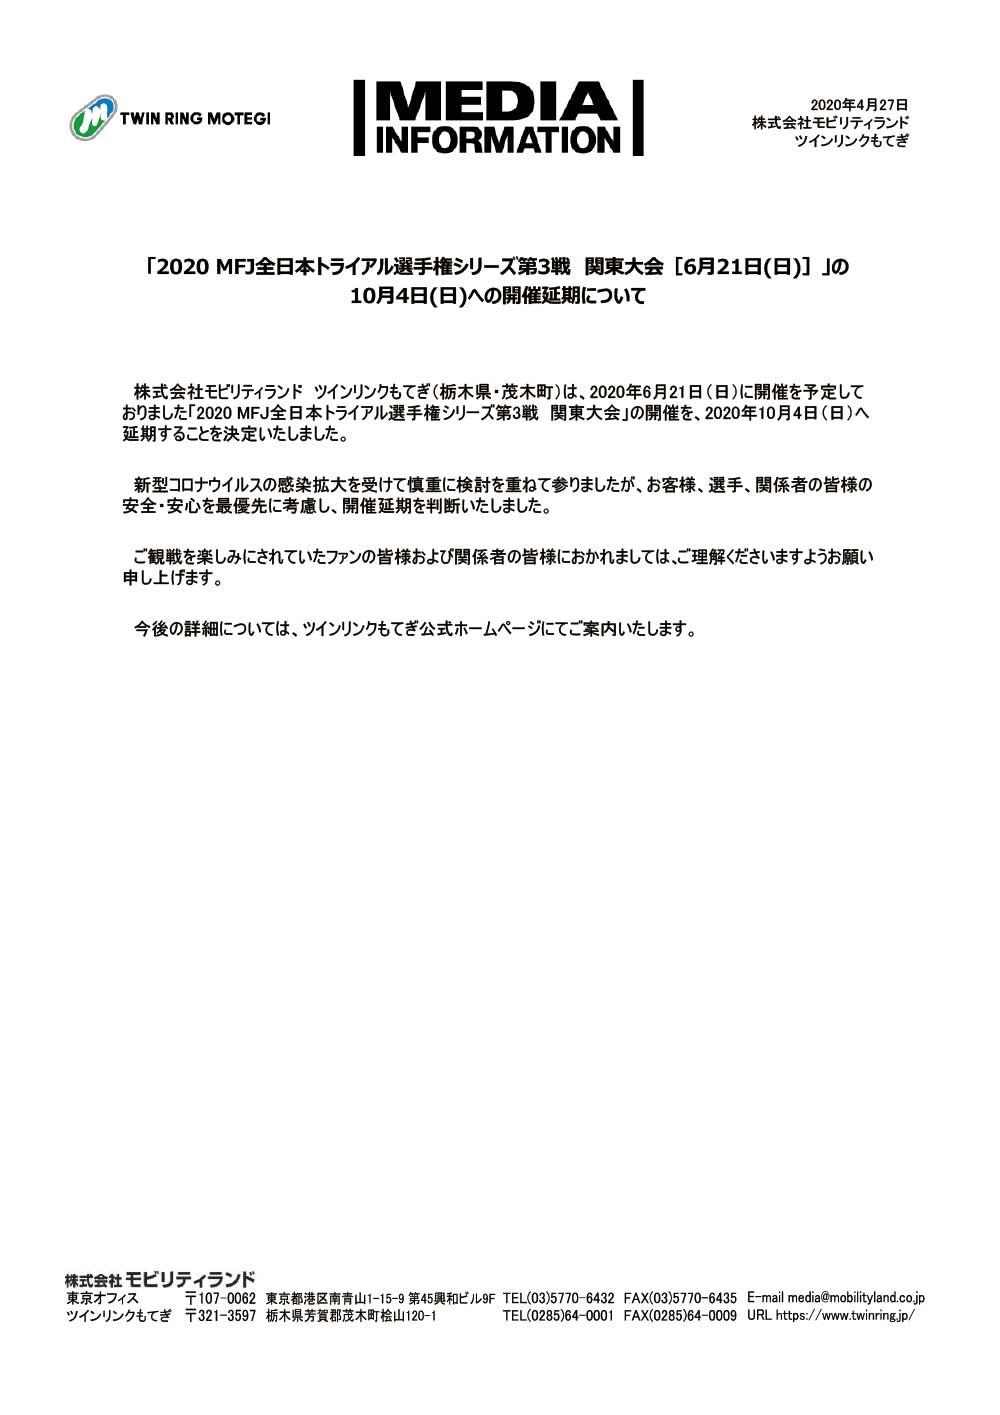 10月4日へ開催延期